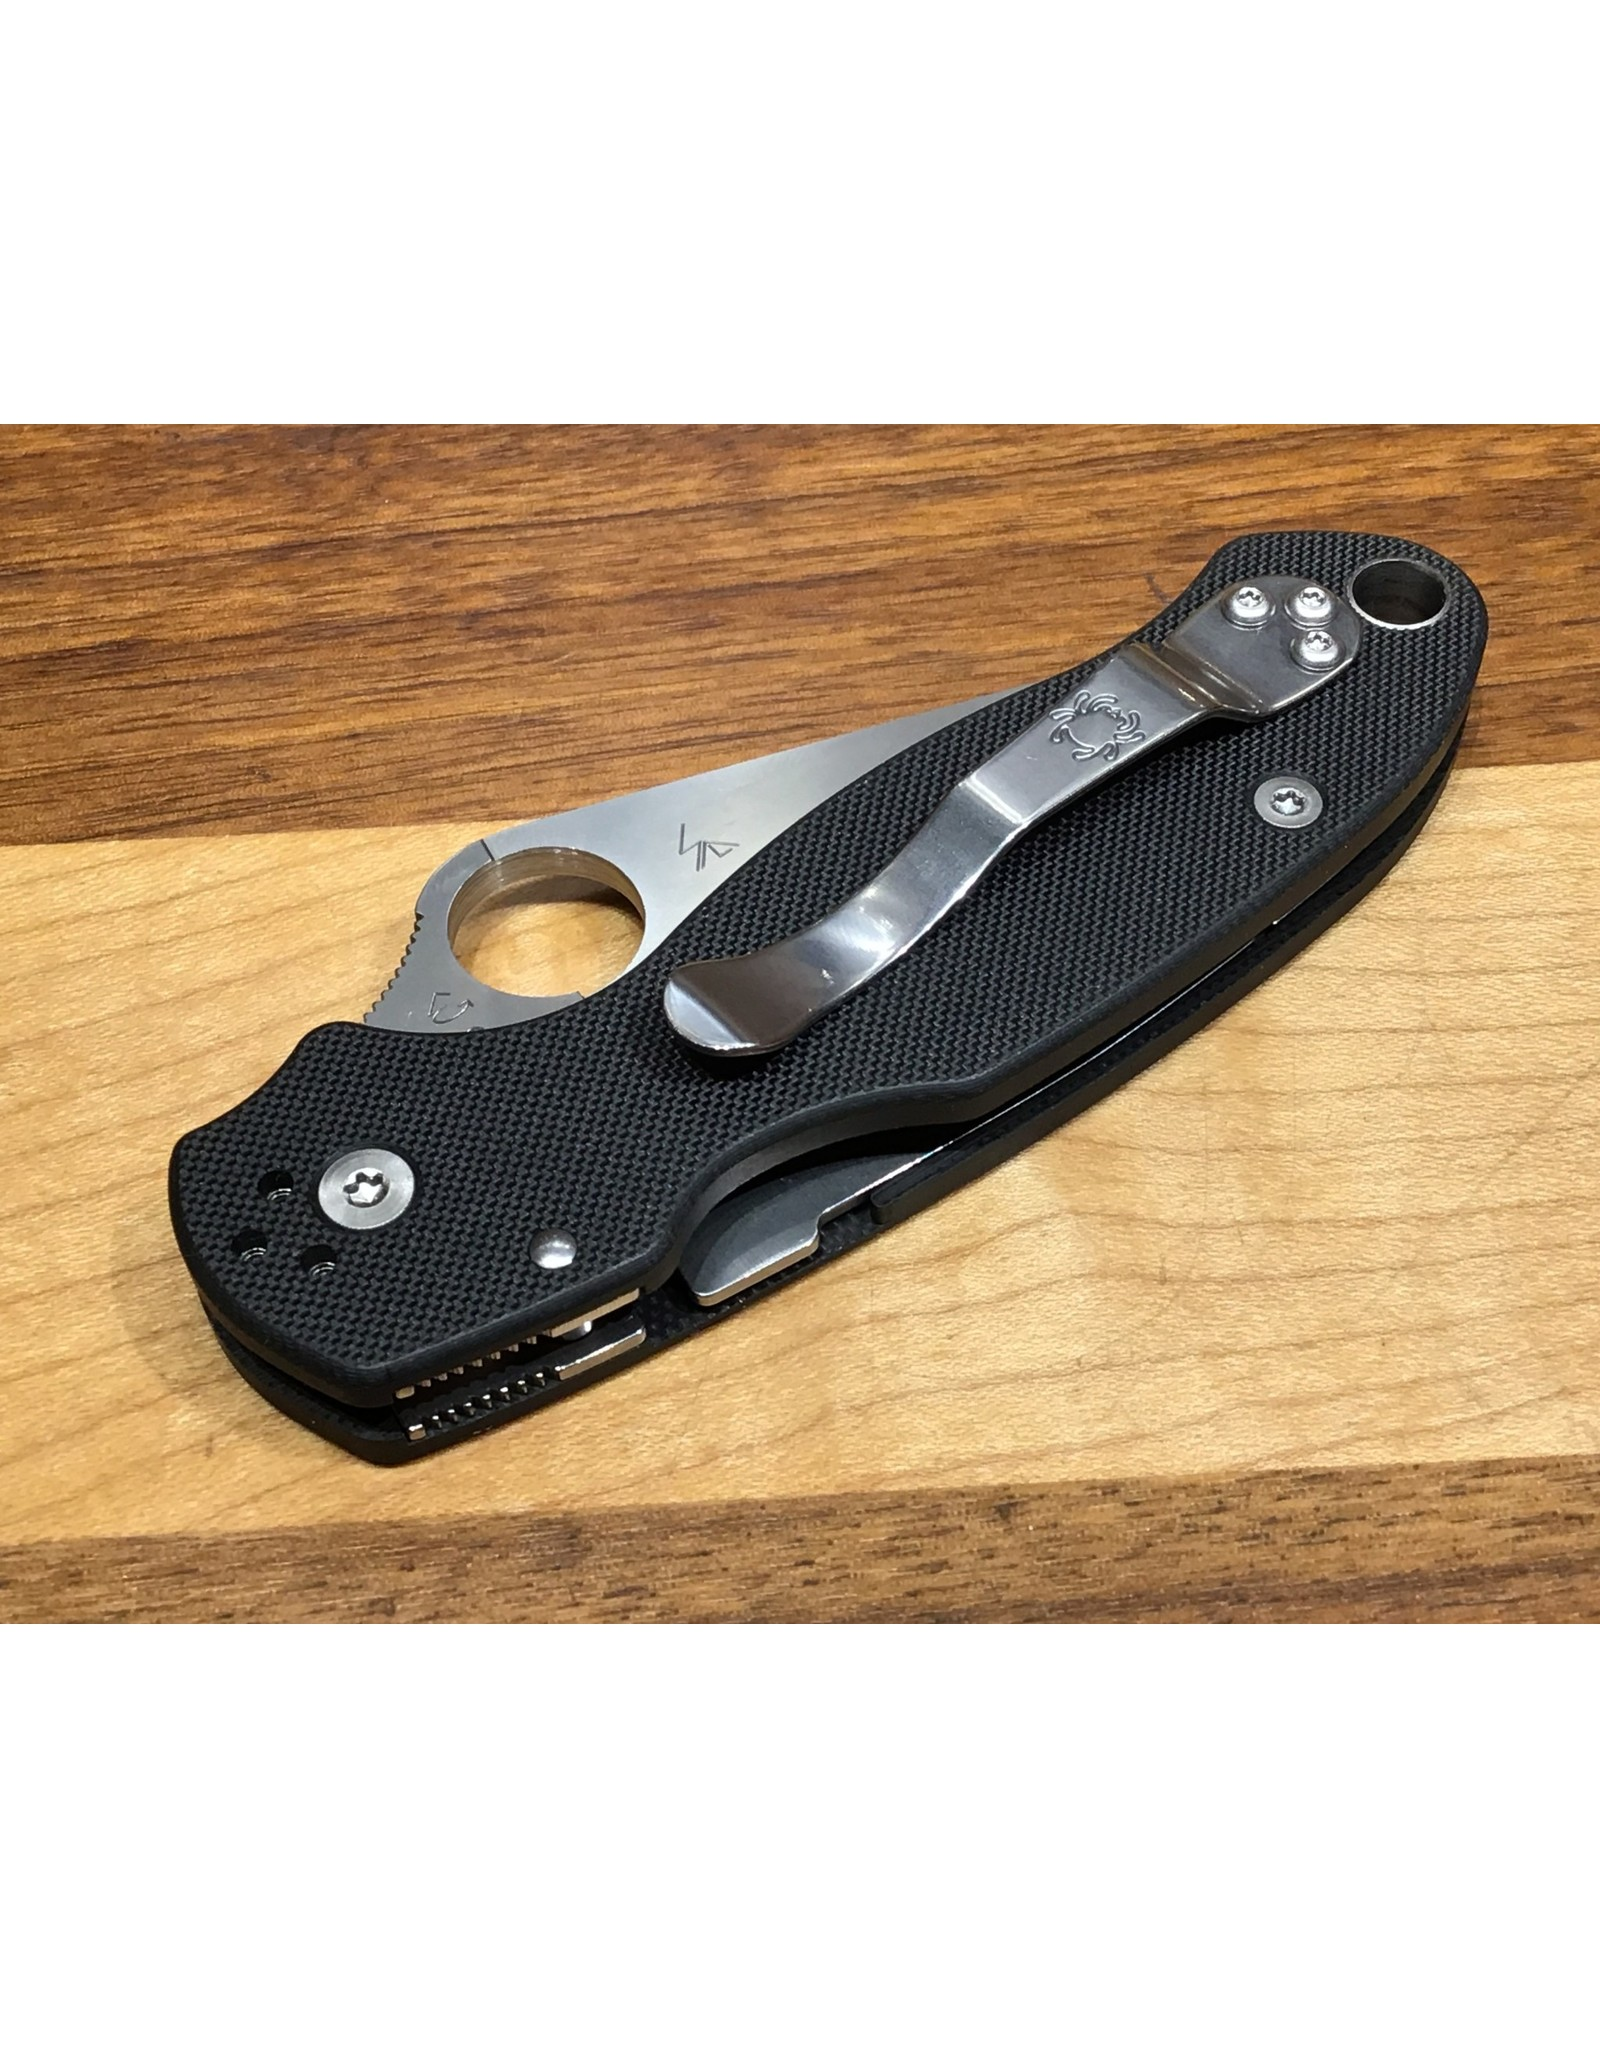 Spyderco Spyderco Para 3 With Black G10 in CPM S30V steel & Compression Lock